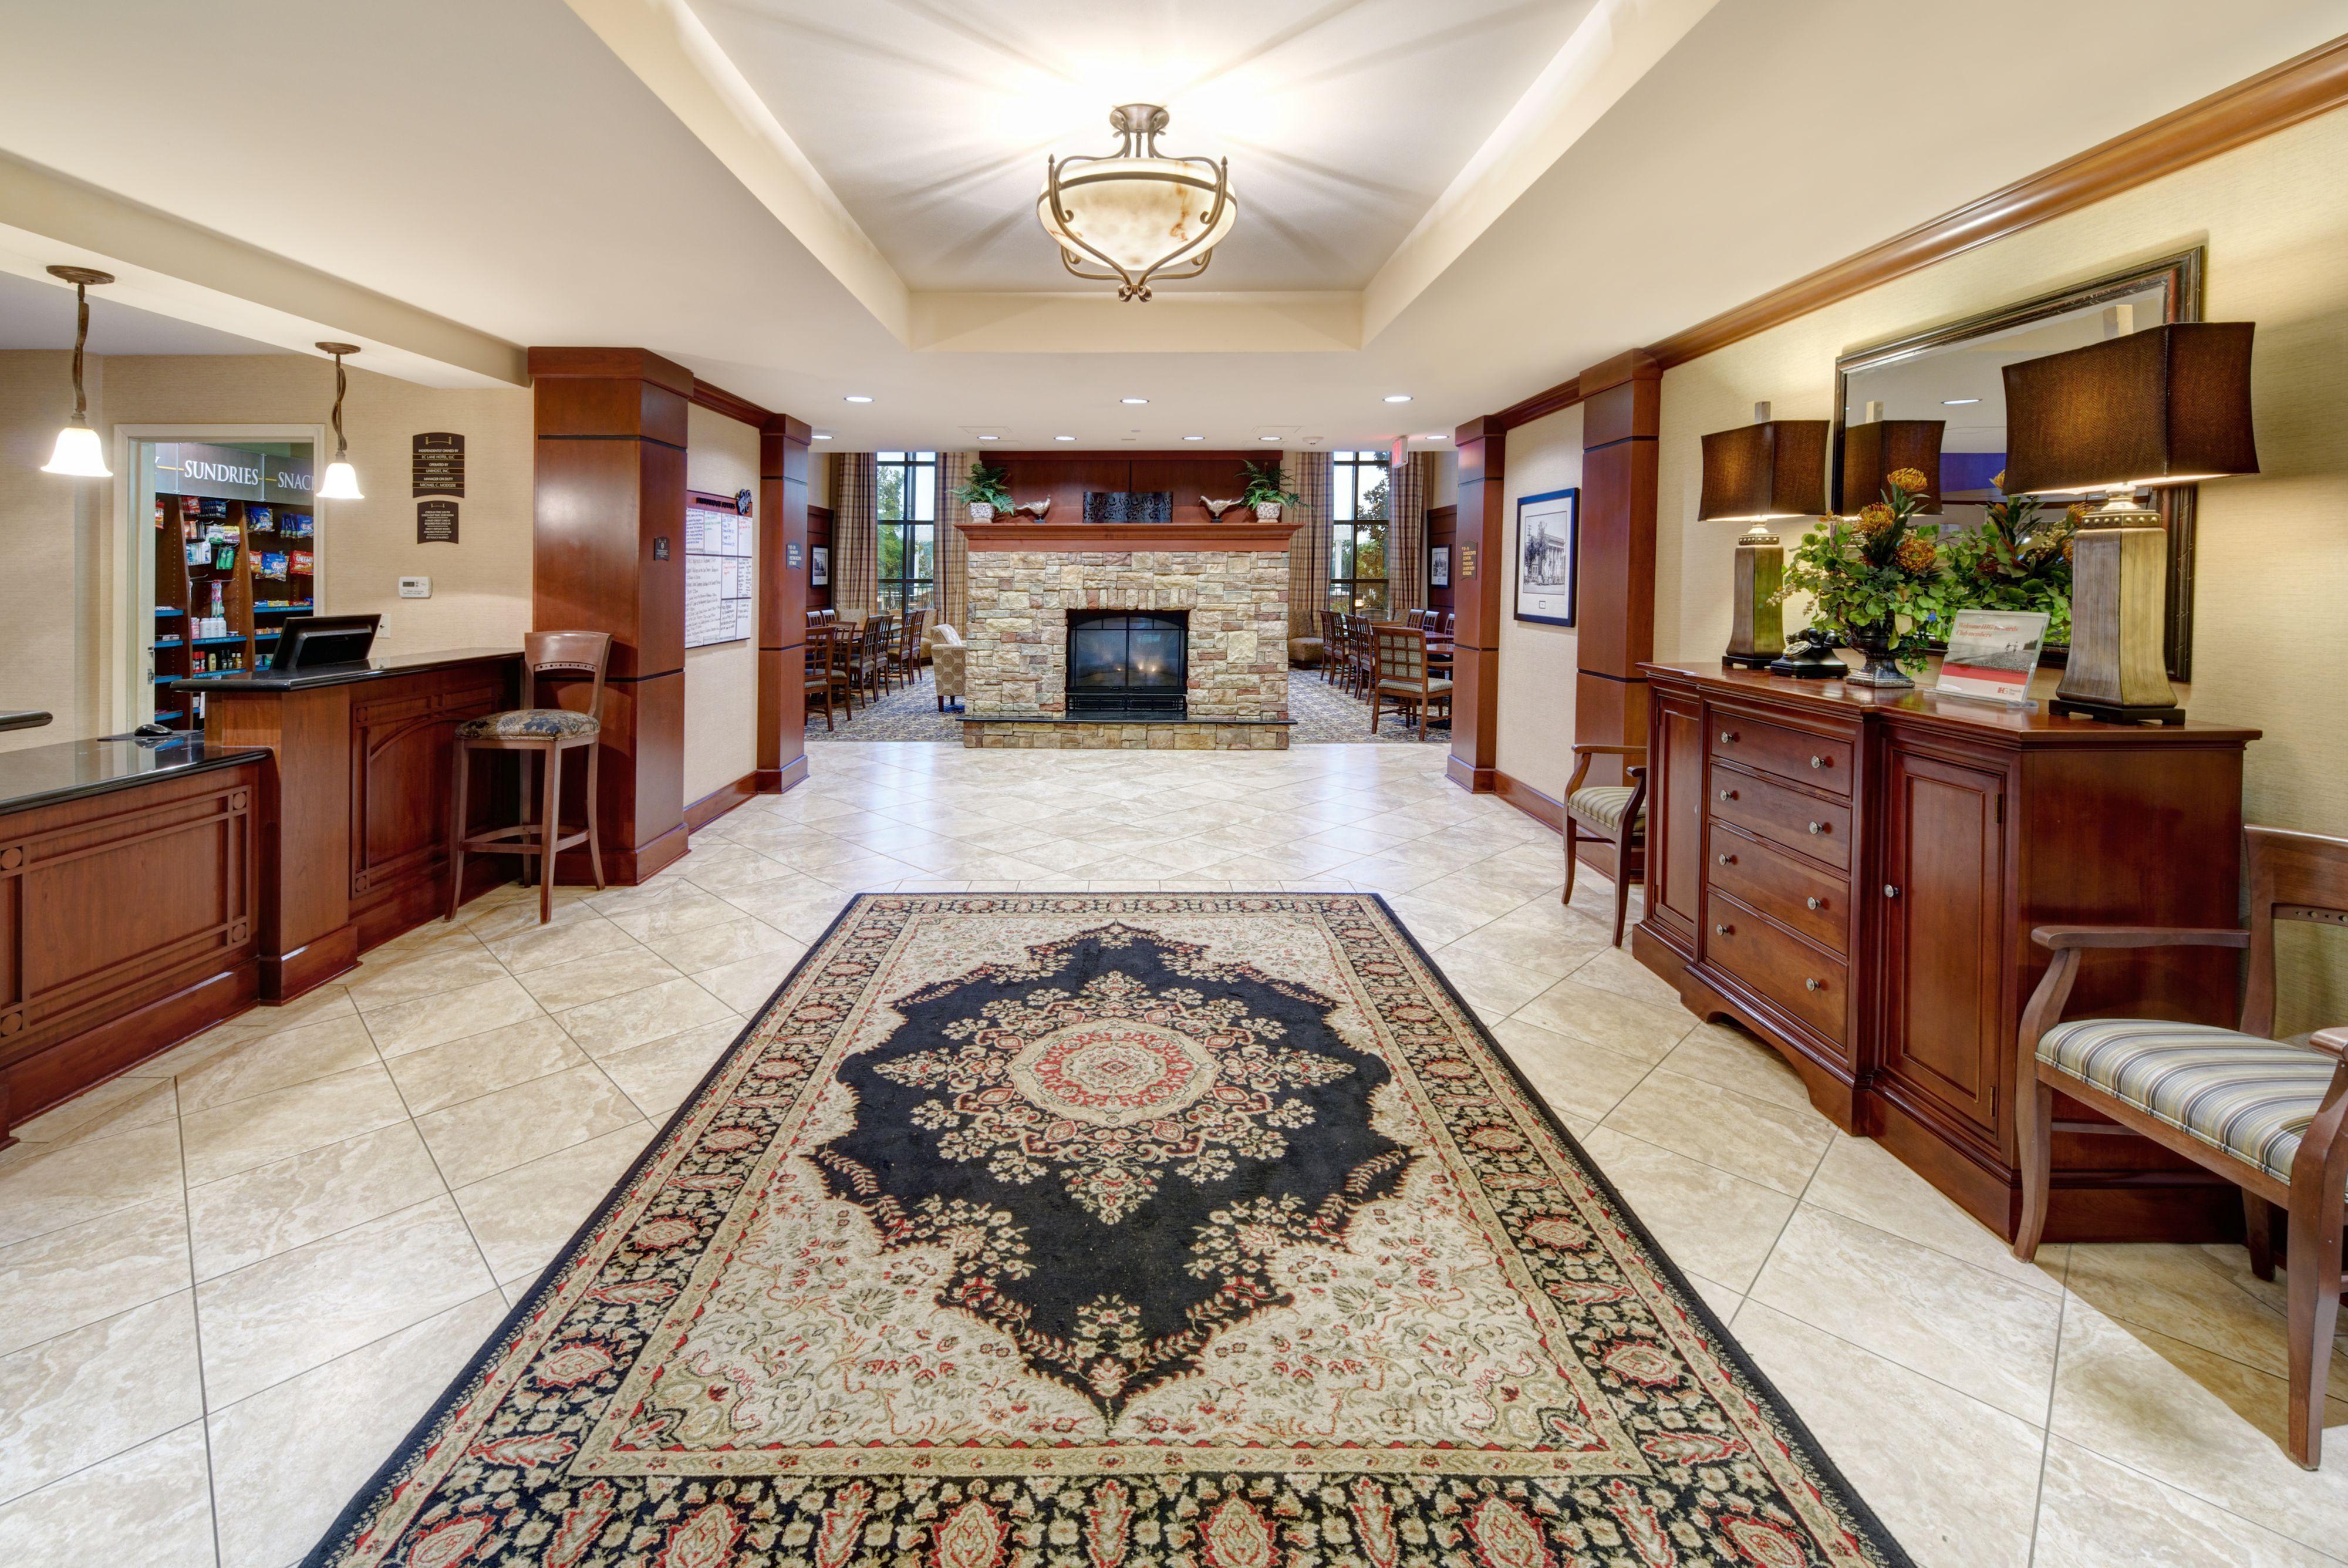 Staybridge suites montgomery eastchase montgomery alabama al for Hilton garden inn eastchase montgomery al